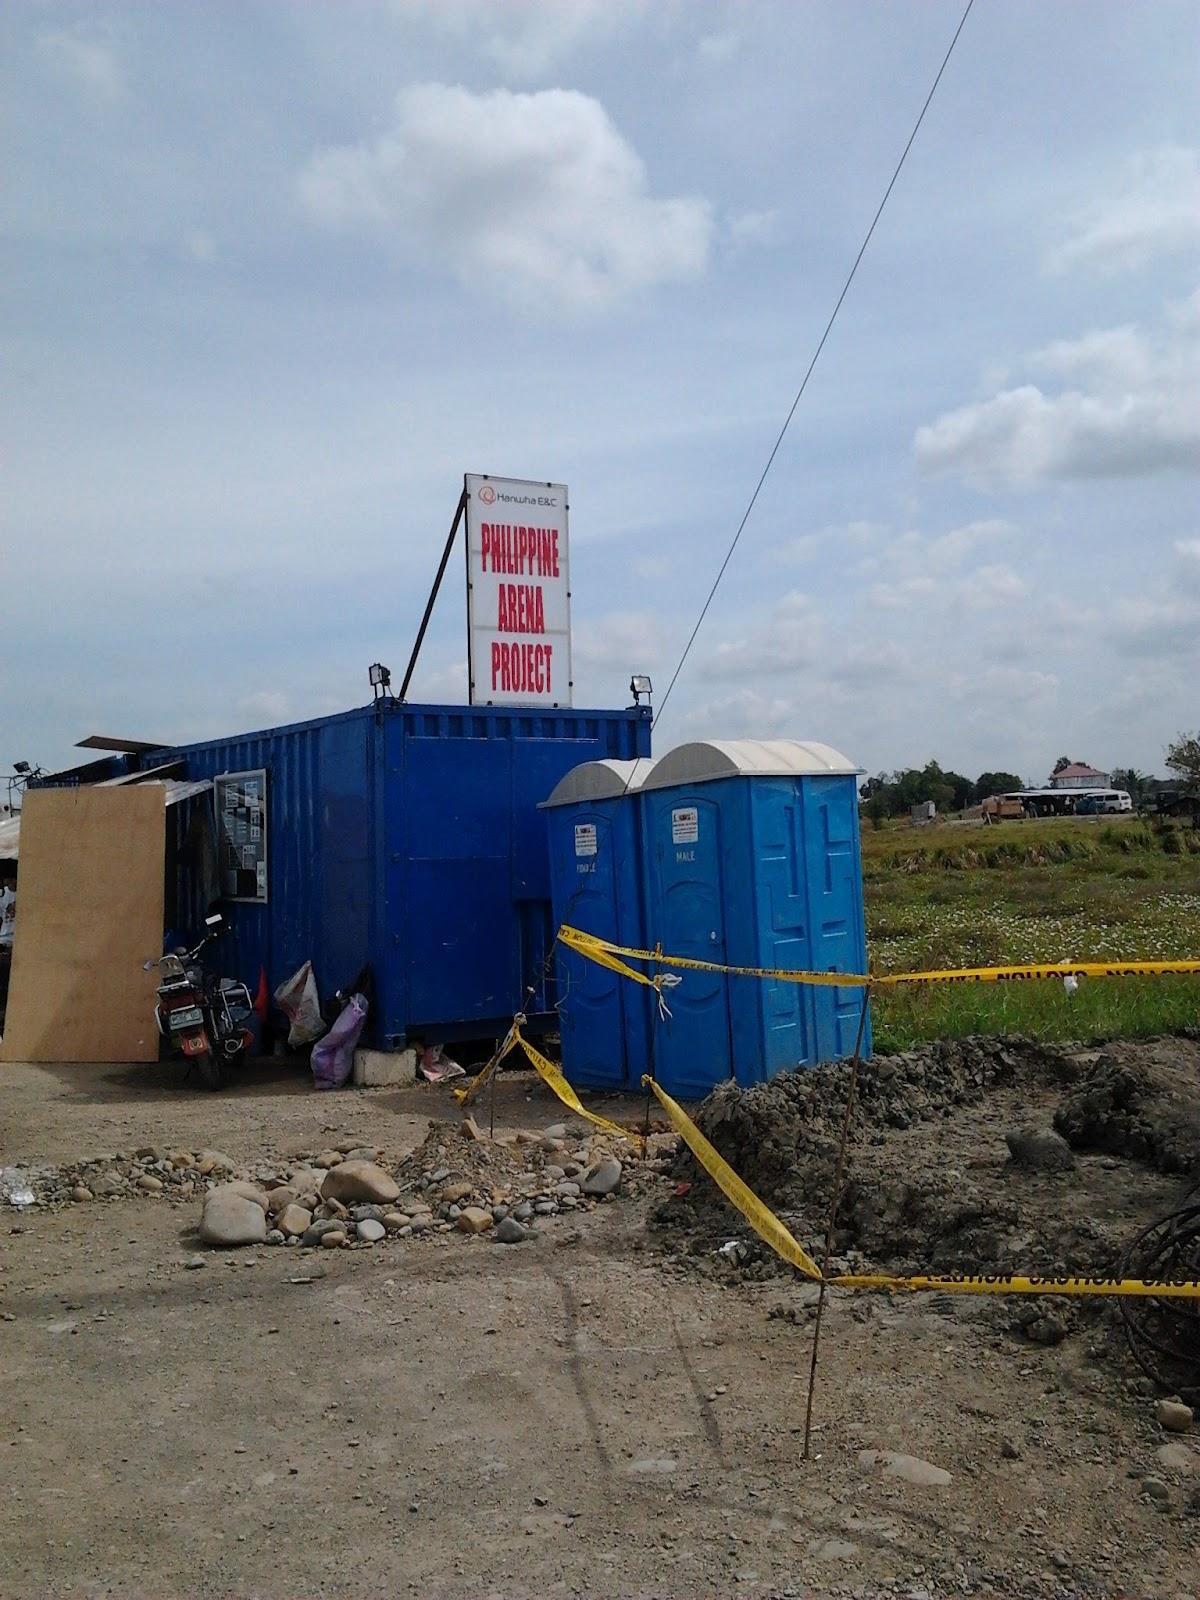 Updates on Philippine Arena Construction